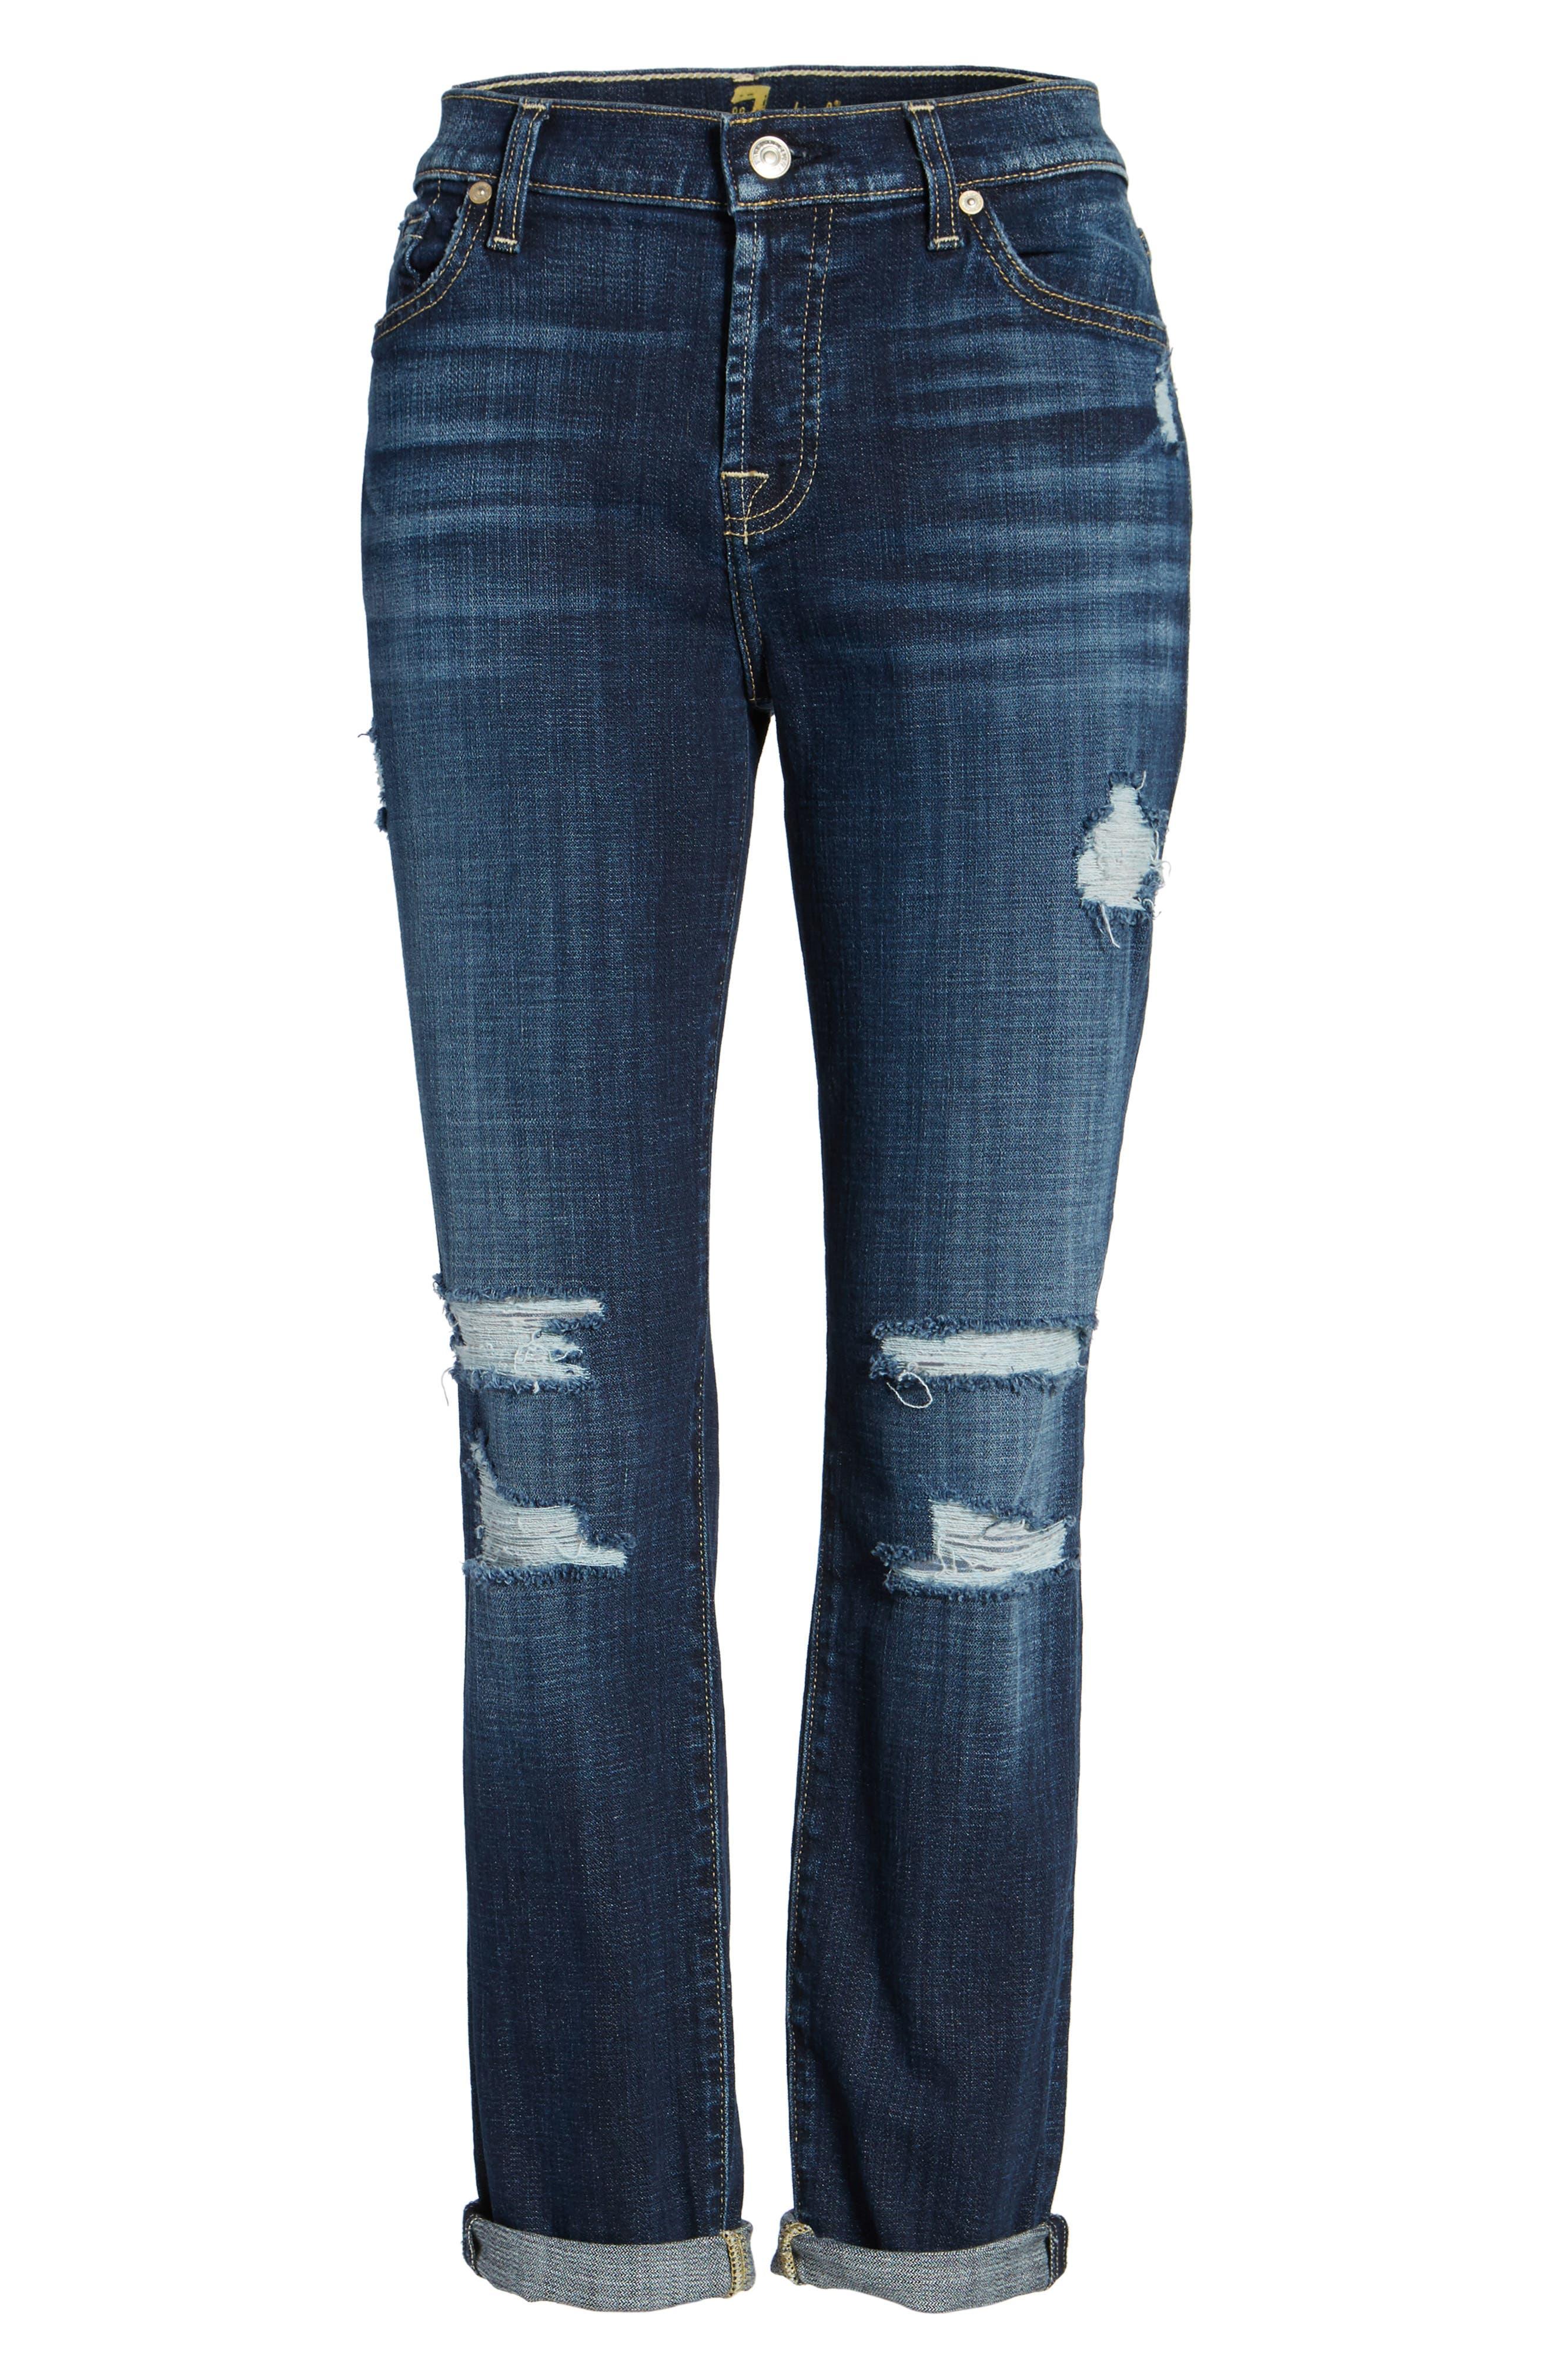 Josefina Boyfriend Jeans,                             Alternate thumbnail 8, color,                             Majestic Broken Twill